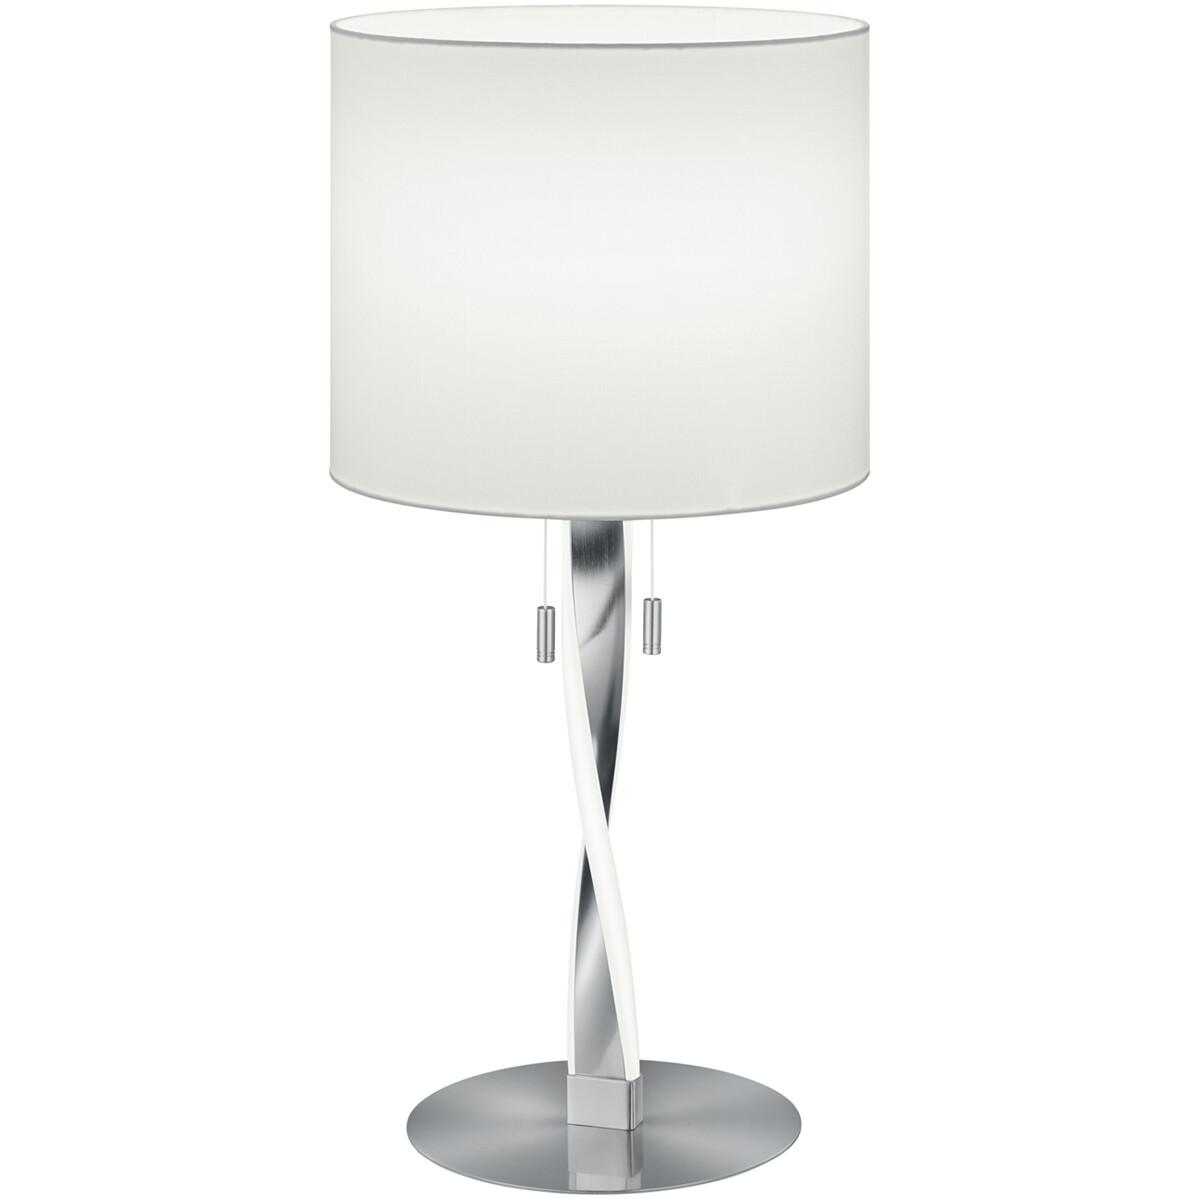 LED Tafellamp - Tafelverlichting - Trion Ninda - E27 Fitting - 6W - Warm Wit 3000K - Rond - Mat Nikk